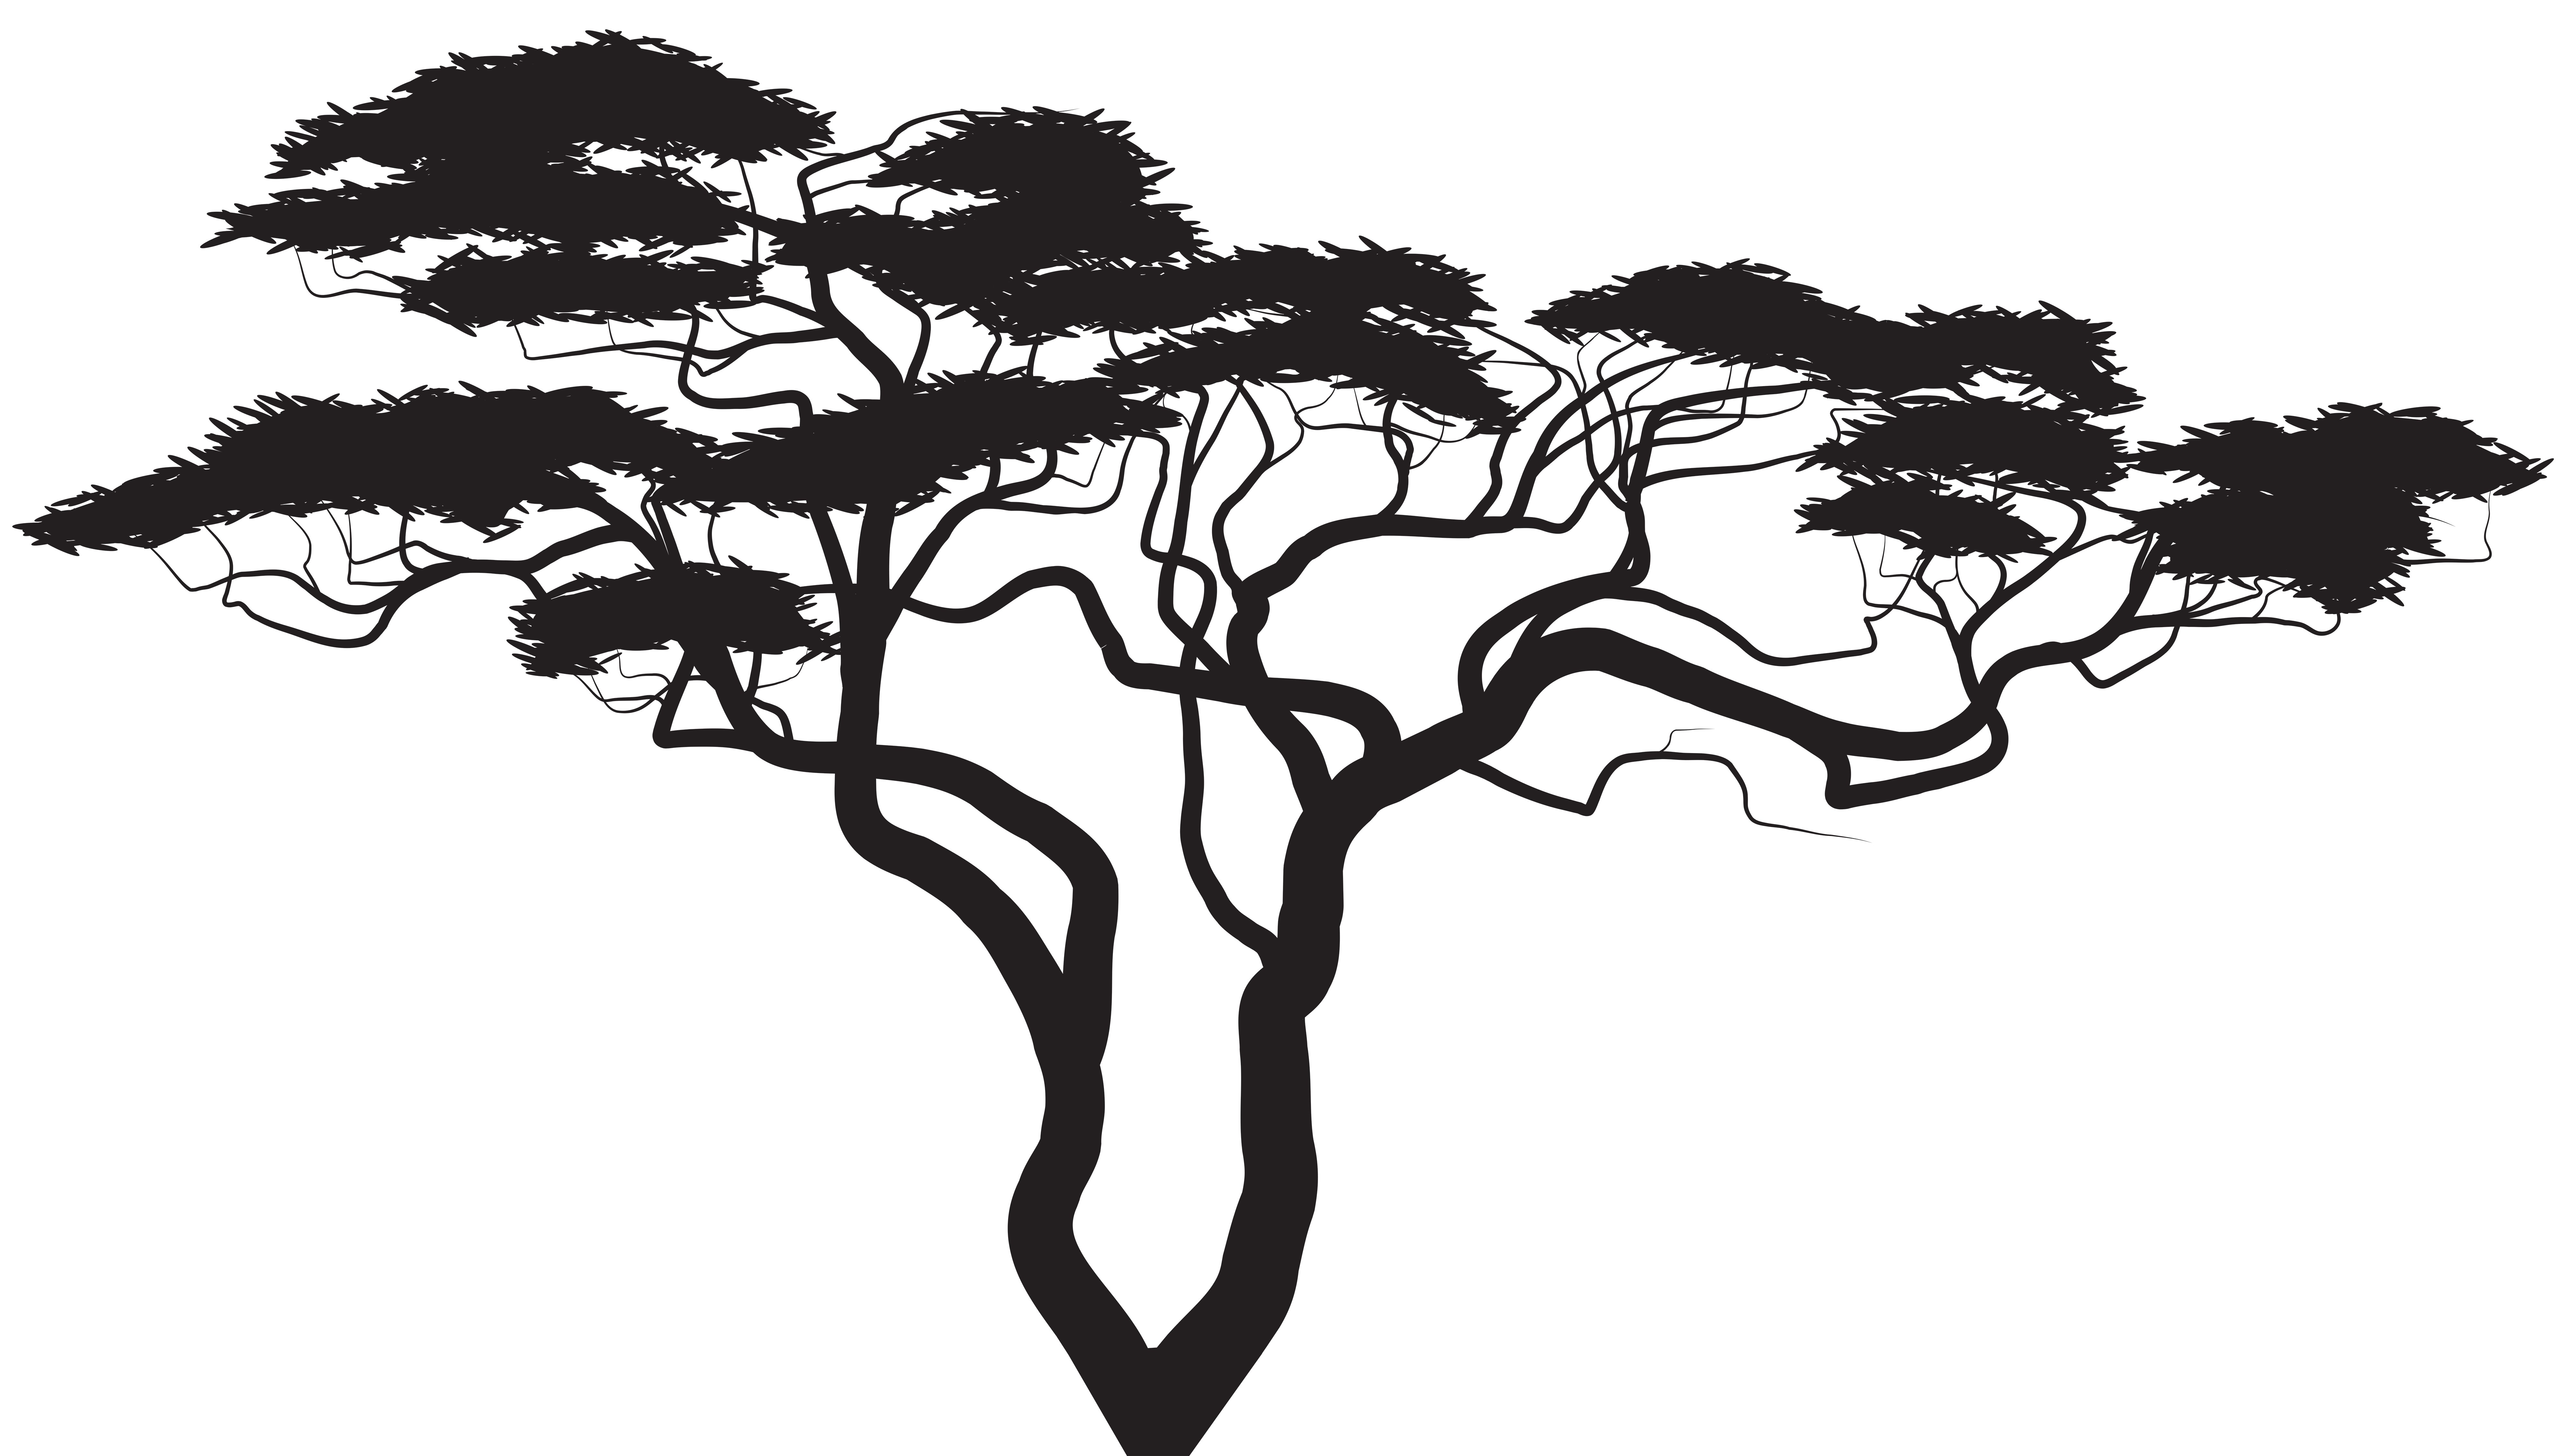 Royalty free tree clipart vector free stock Silhouette Tree Royalty-free Clip art - Exotic Tree Silhouette PNG ... vector free stock